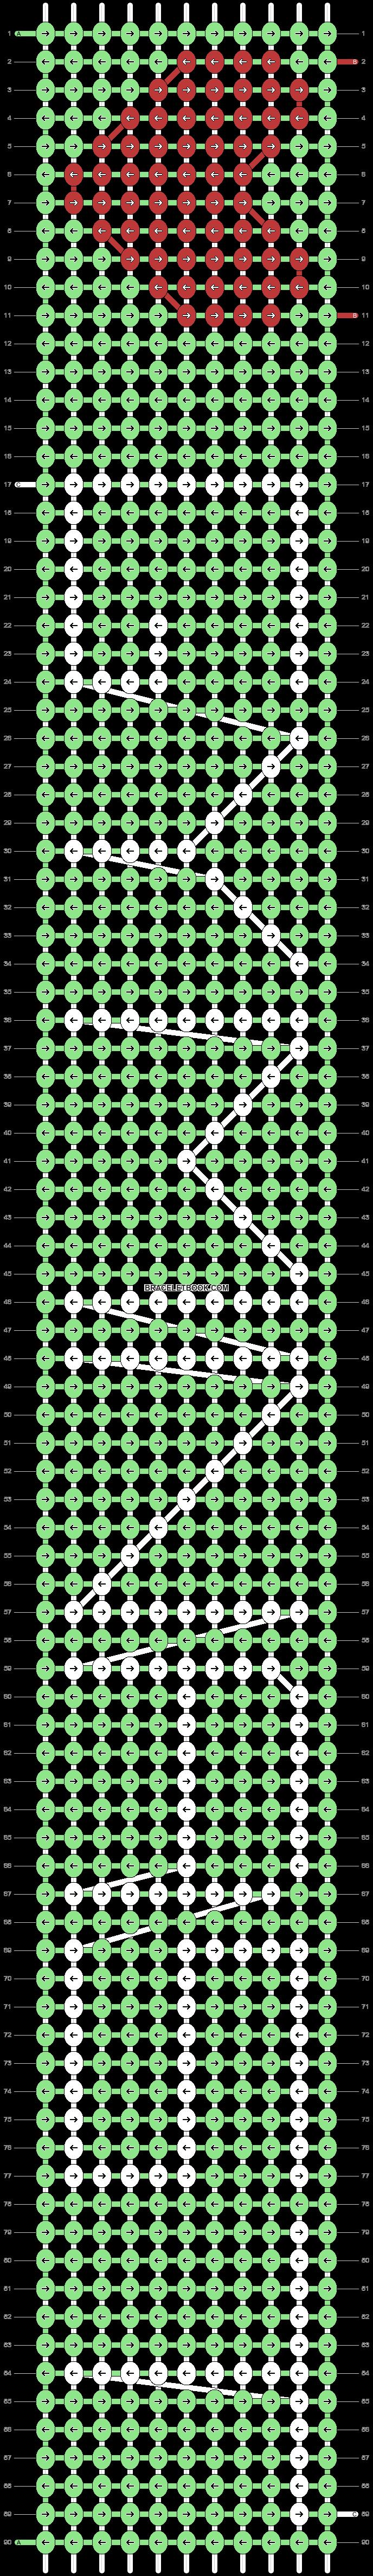 Alpha pattern #18175 variation #33084 pattern